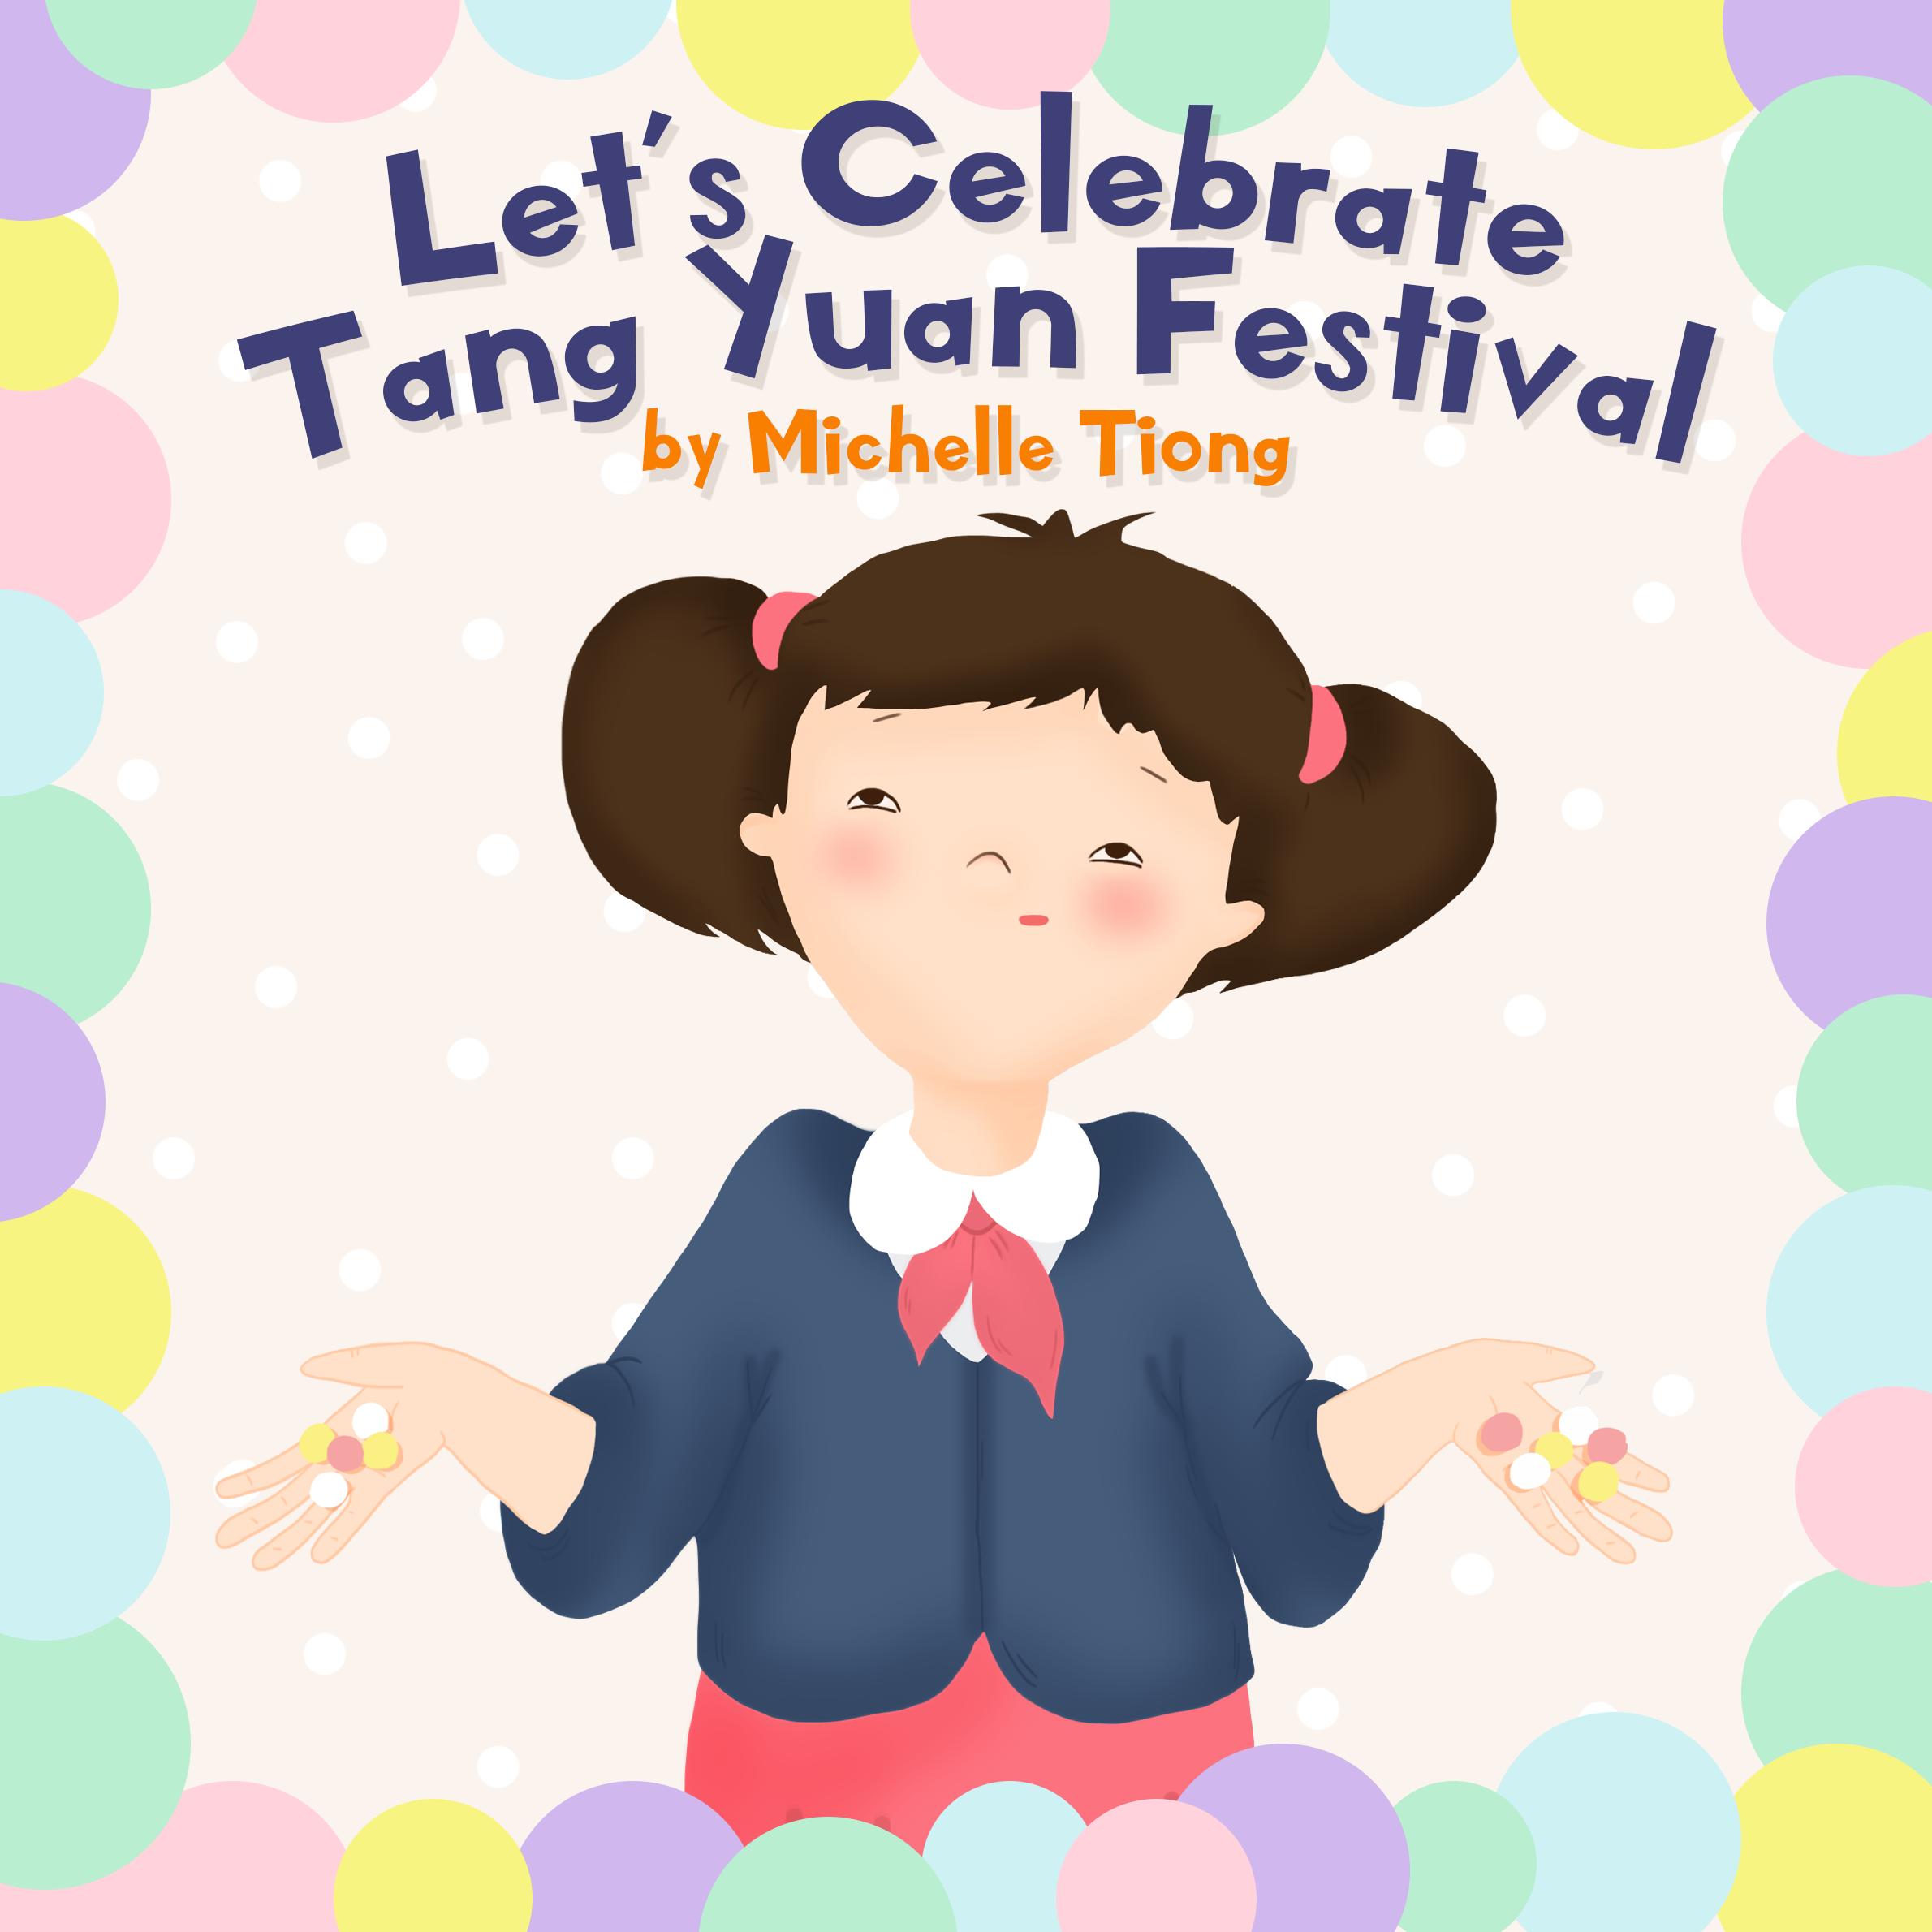 Let's Celebrate Tang Yuan Festival